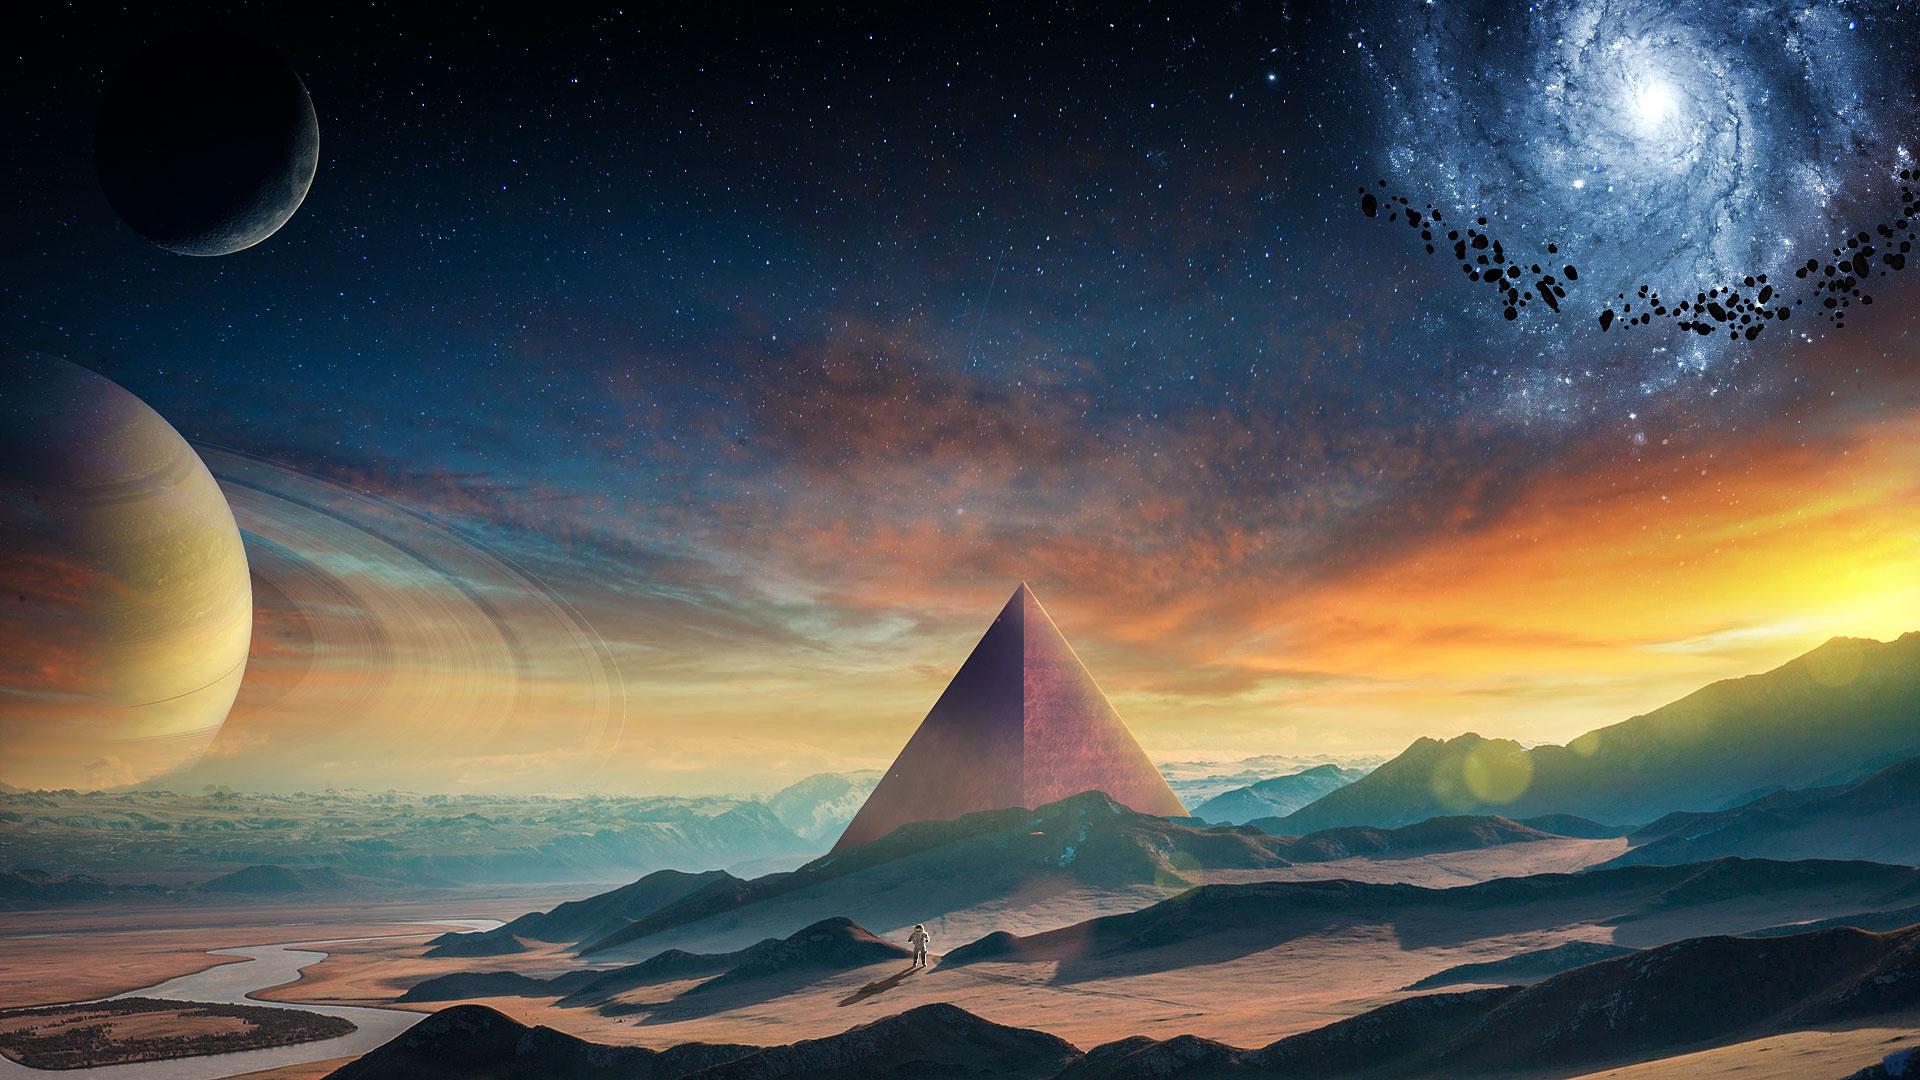 Download 1920x1080 Wallpaper Planet Fantasy Pyramids